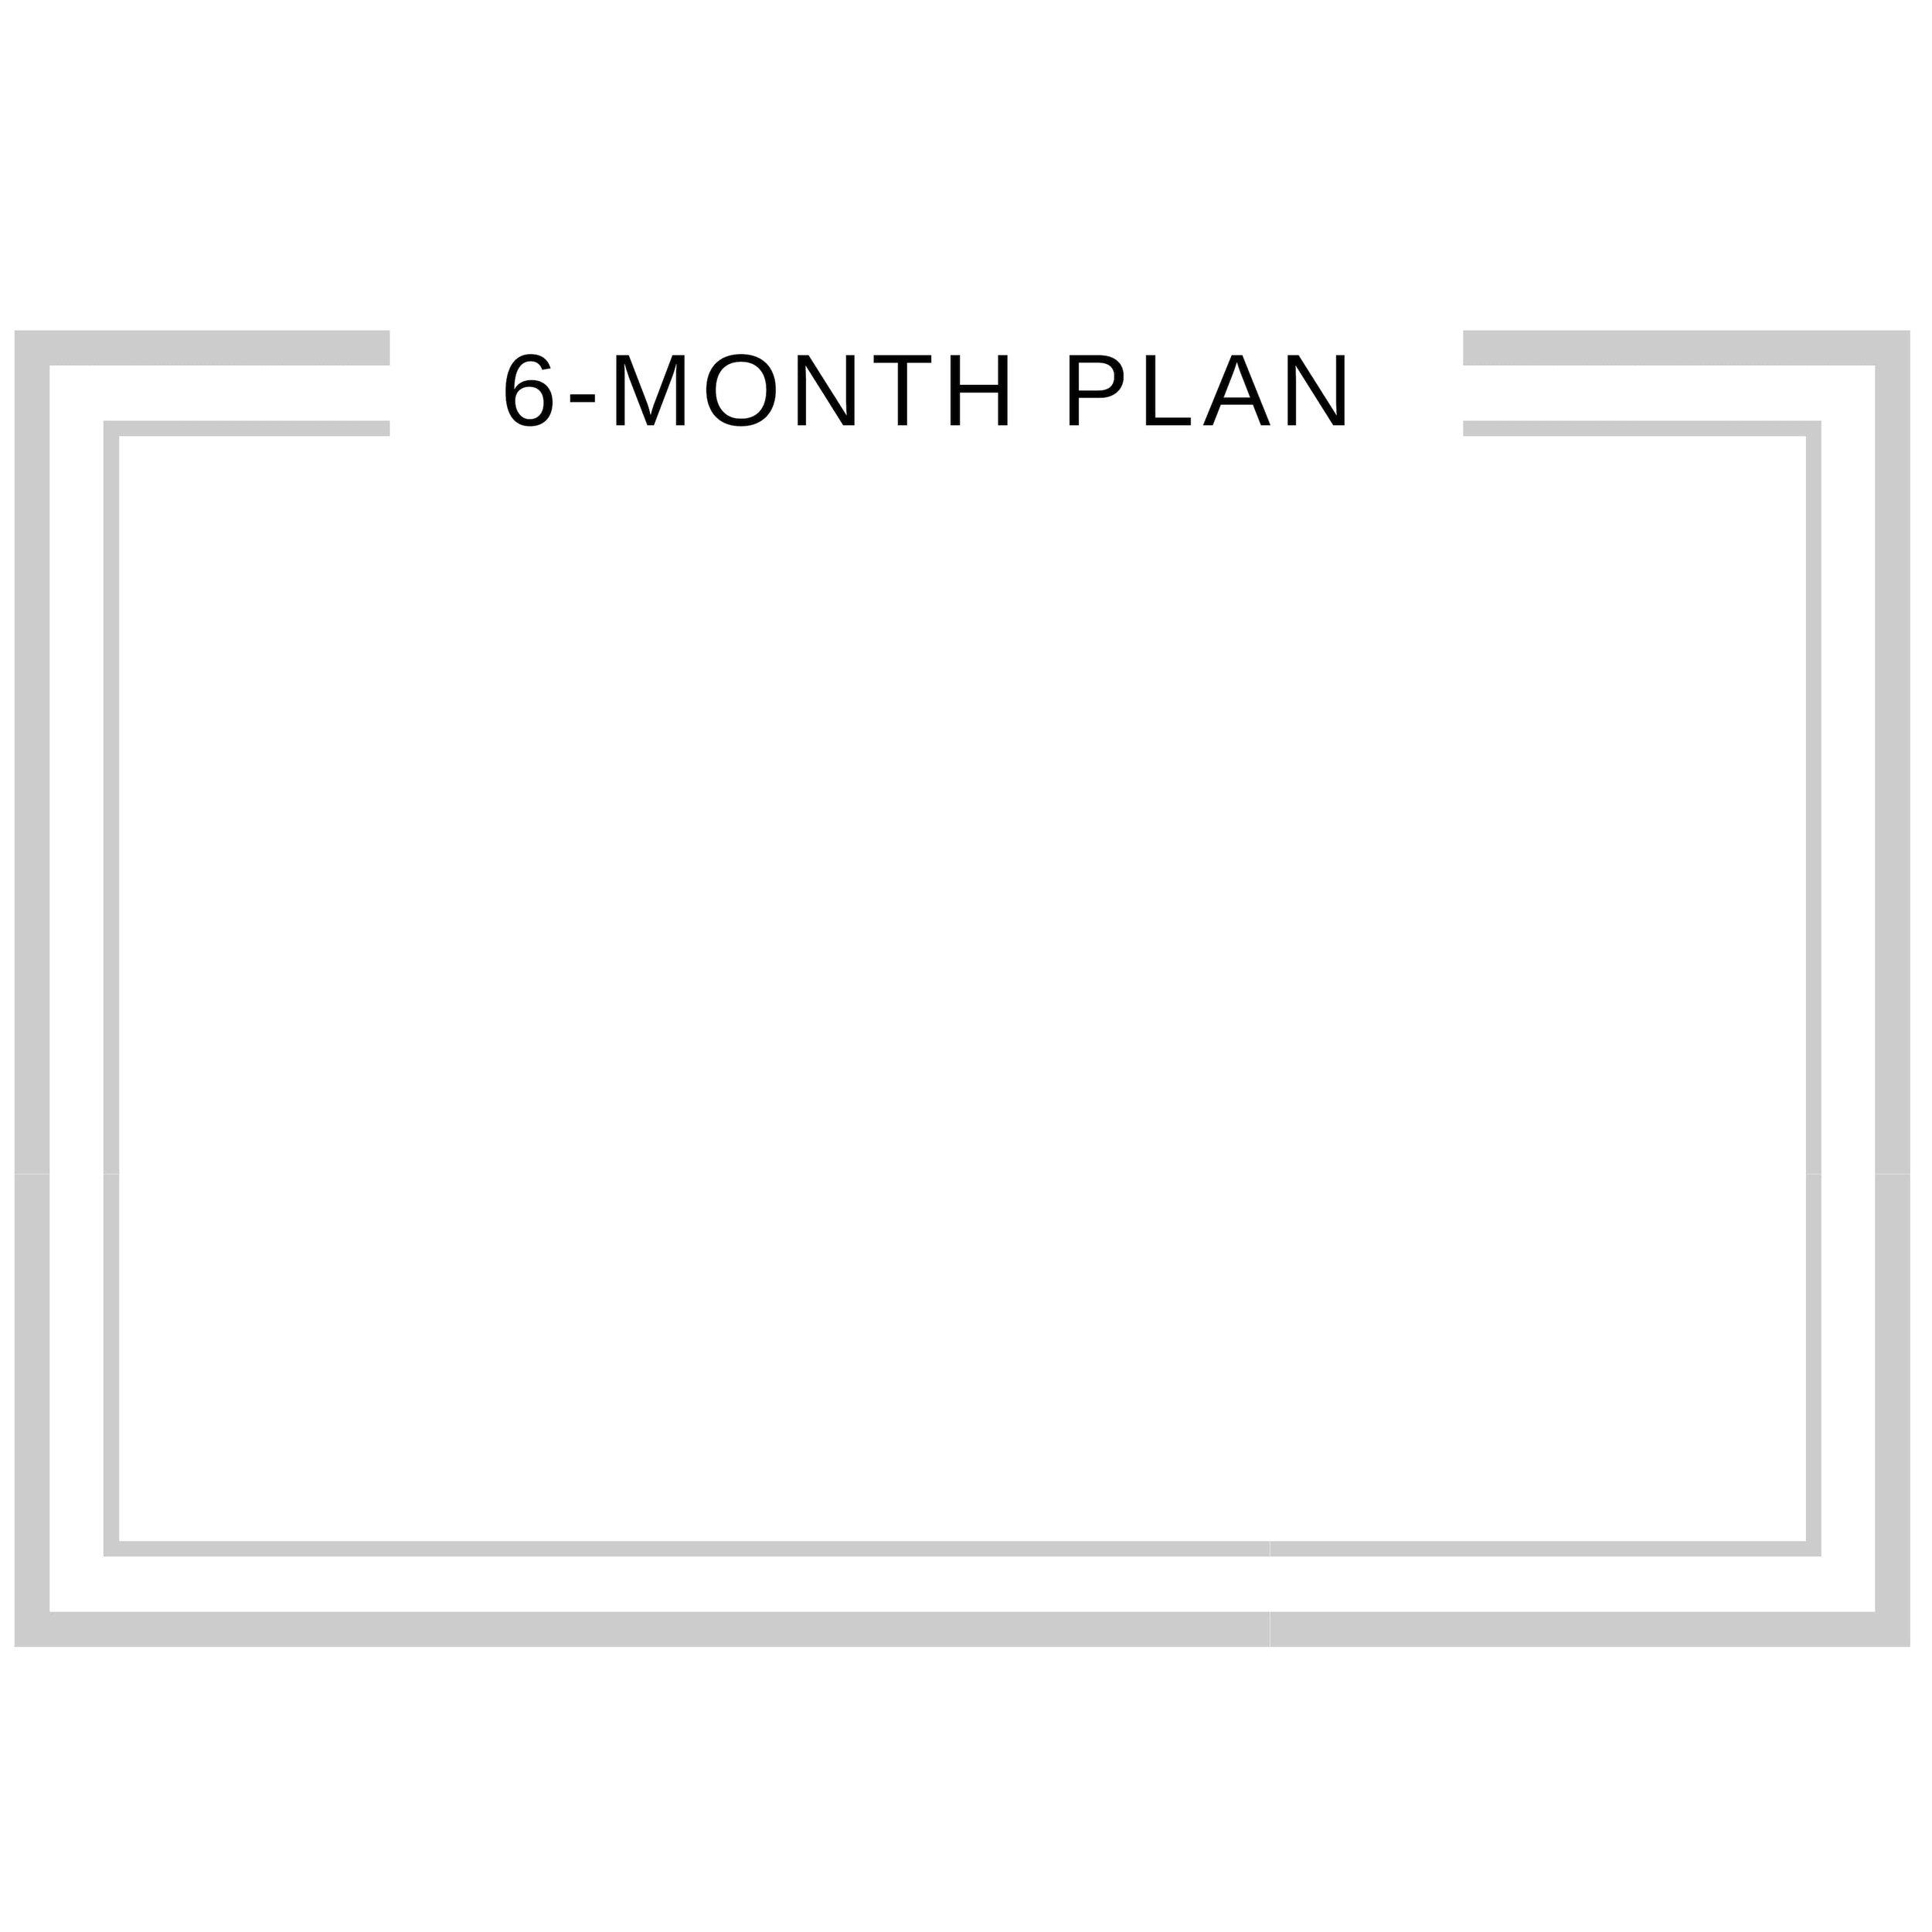 €165 - Free shipping€27.50/ box1 premium box/ month during 6 months